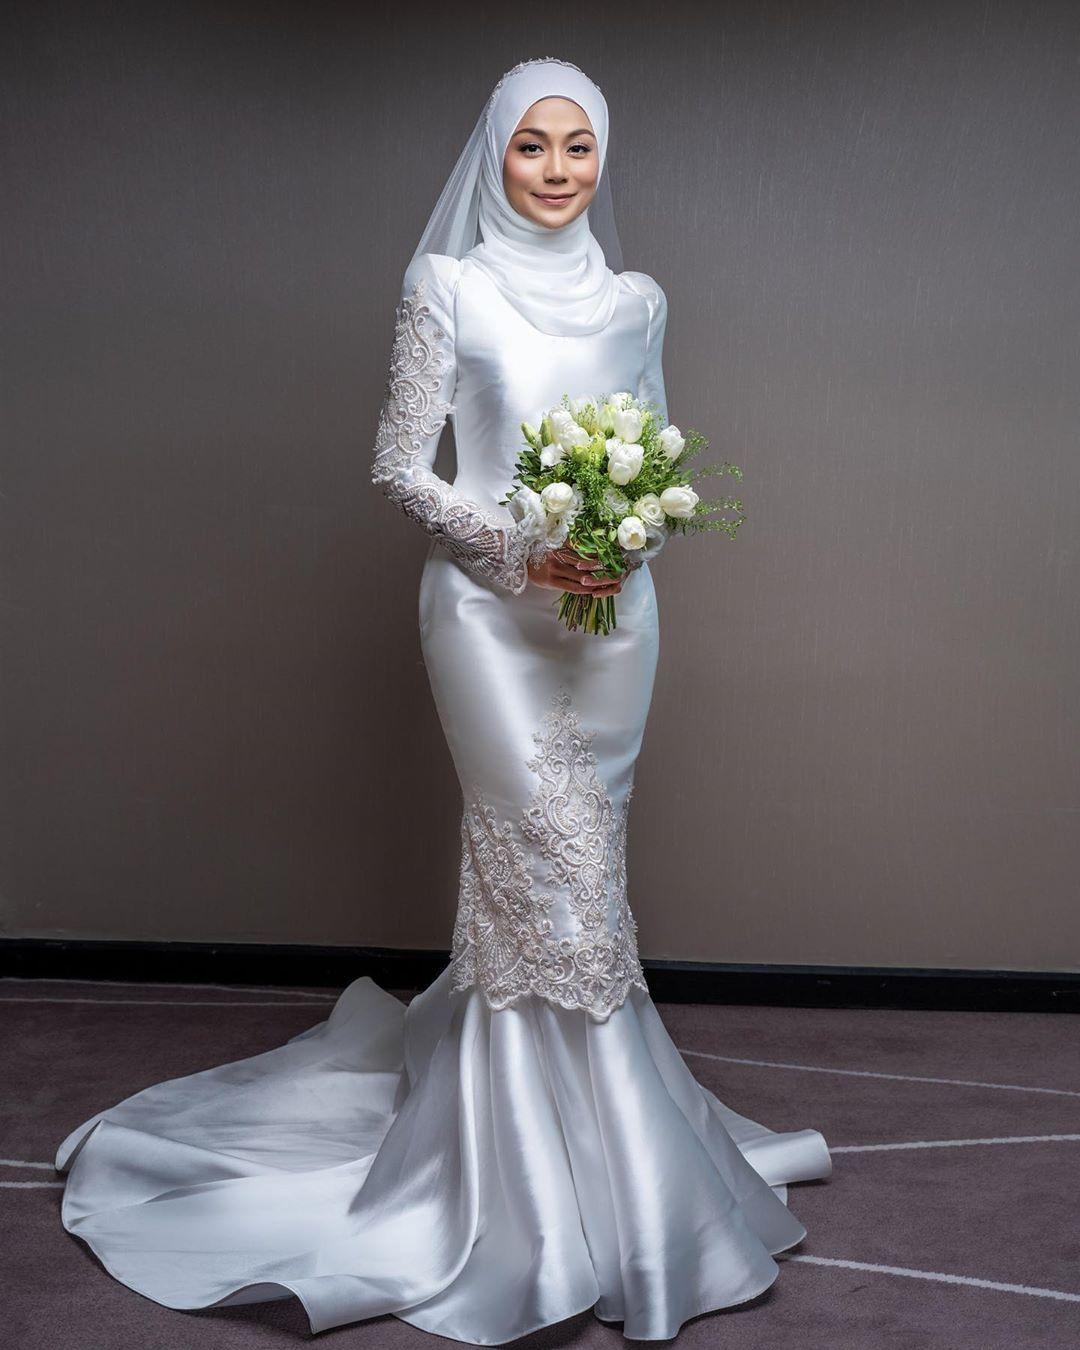 Hatta Dolmat On Instagram Majlis Pernikahan Tashashilla Dan Atiqidris 28 February 2020 Ke Dua Pakaian Pernikahan Gaun Pengantin Sederhana Pengantin Wanita